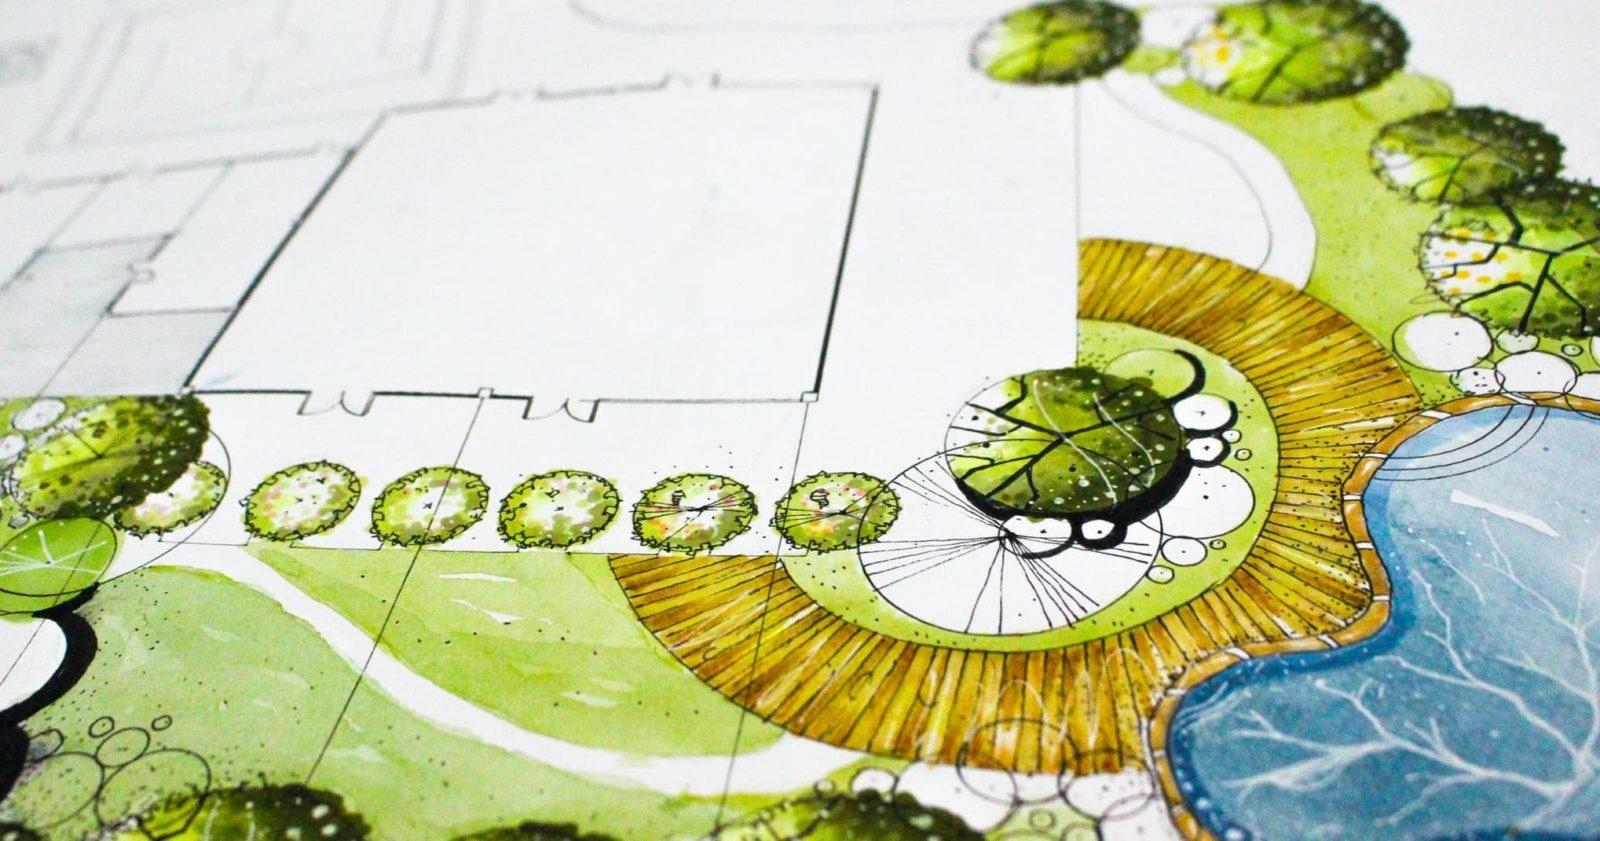 birds eye drawings on paper of a landscaped garden